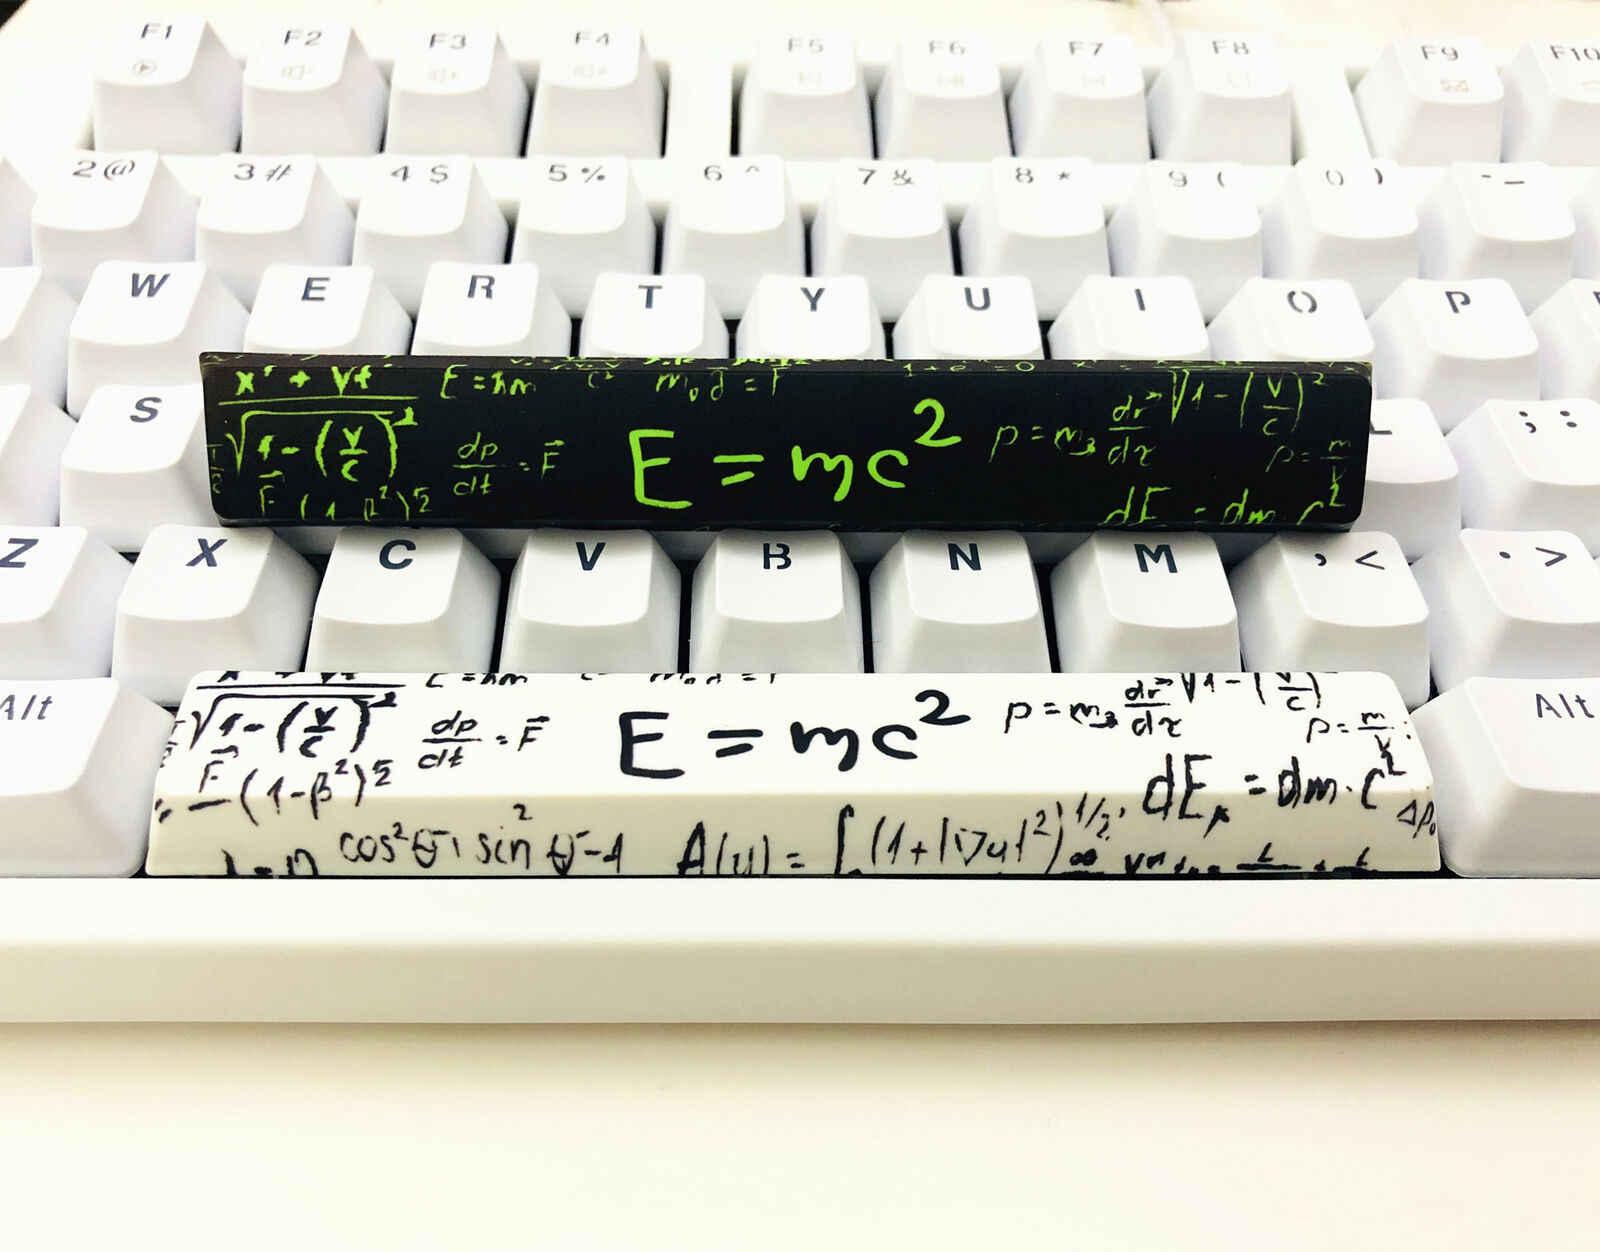 E = mc2 染料サブスペースバーキーキャップアインシュタインエネルギーマス式桜プロファイル mx メカニカルゲーミングキーボード